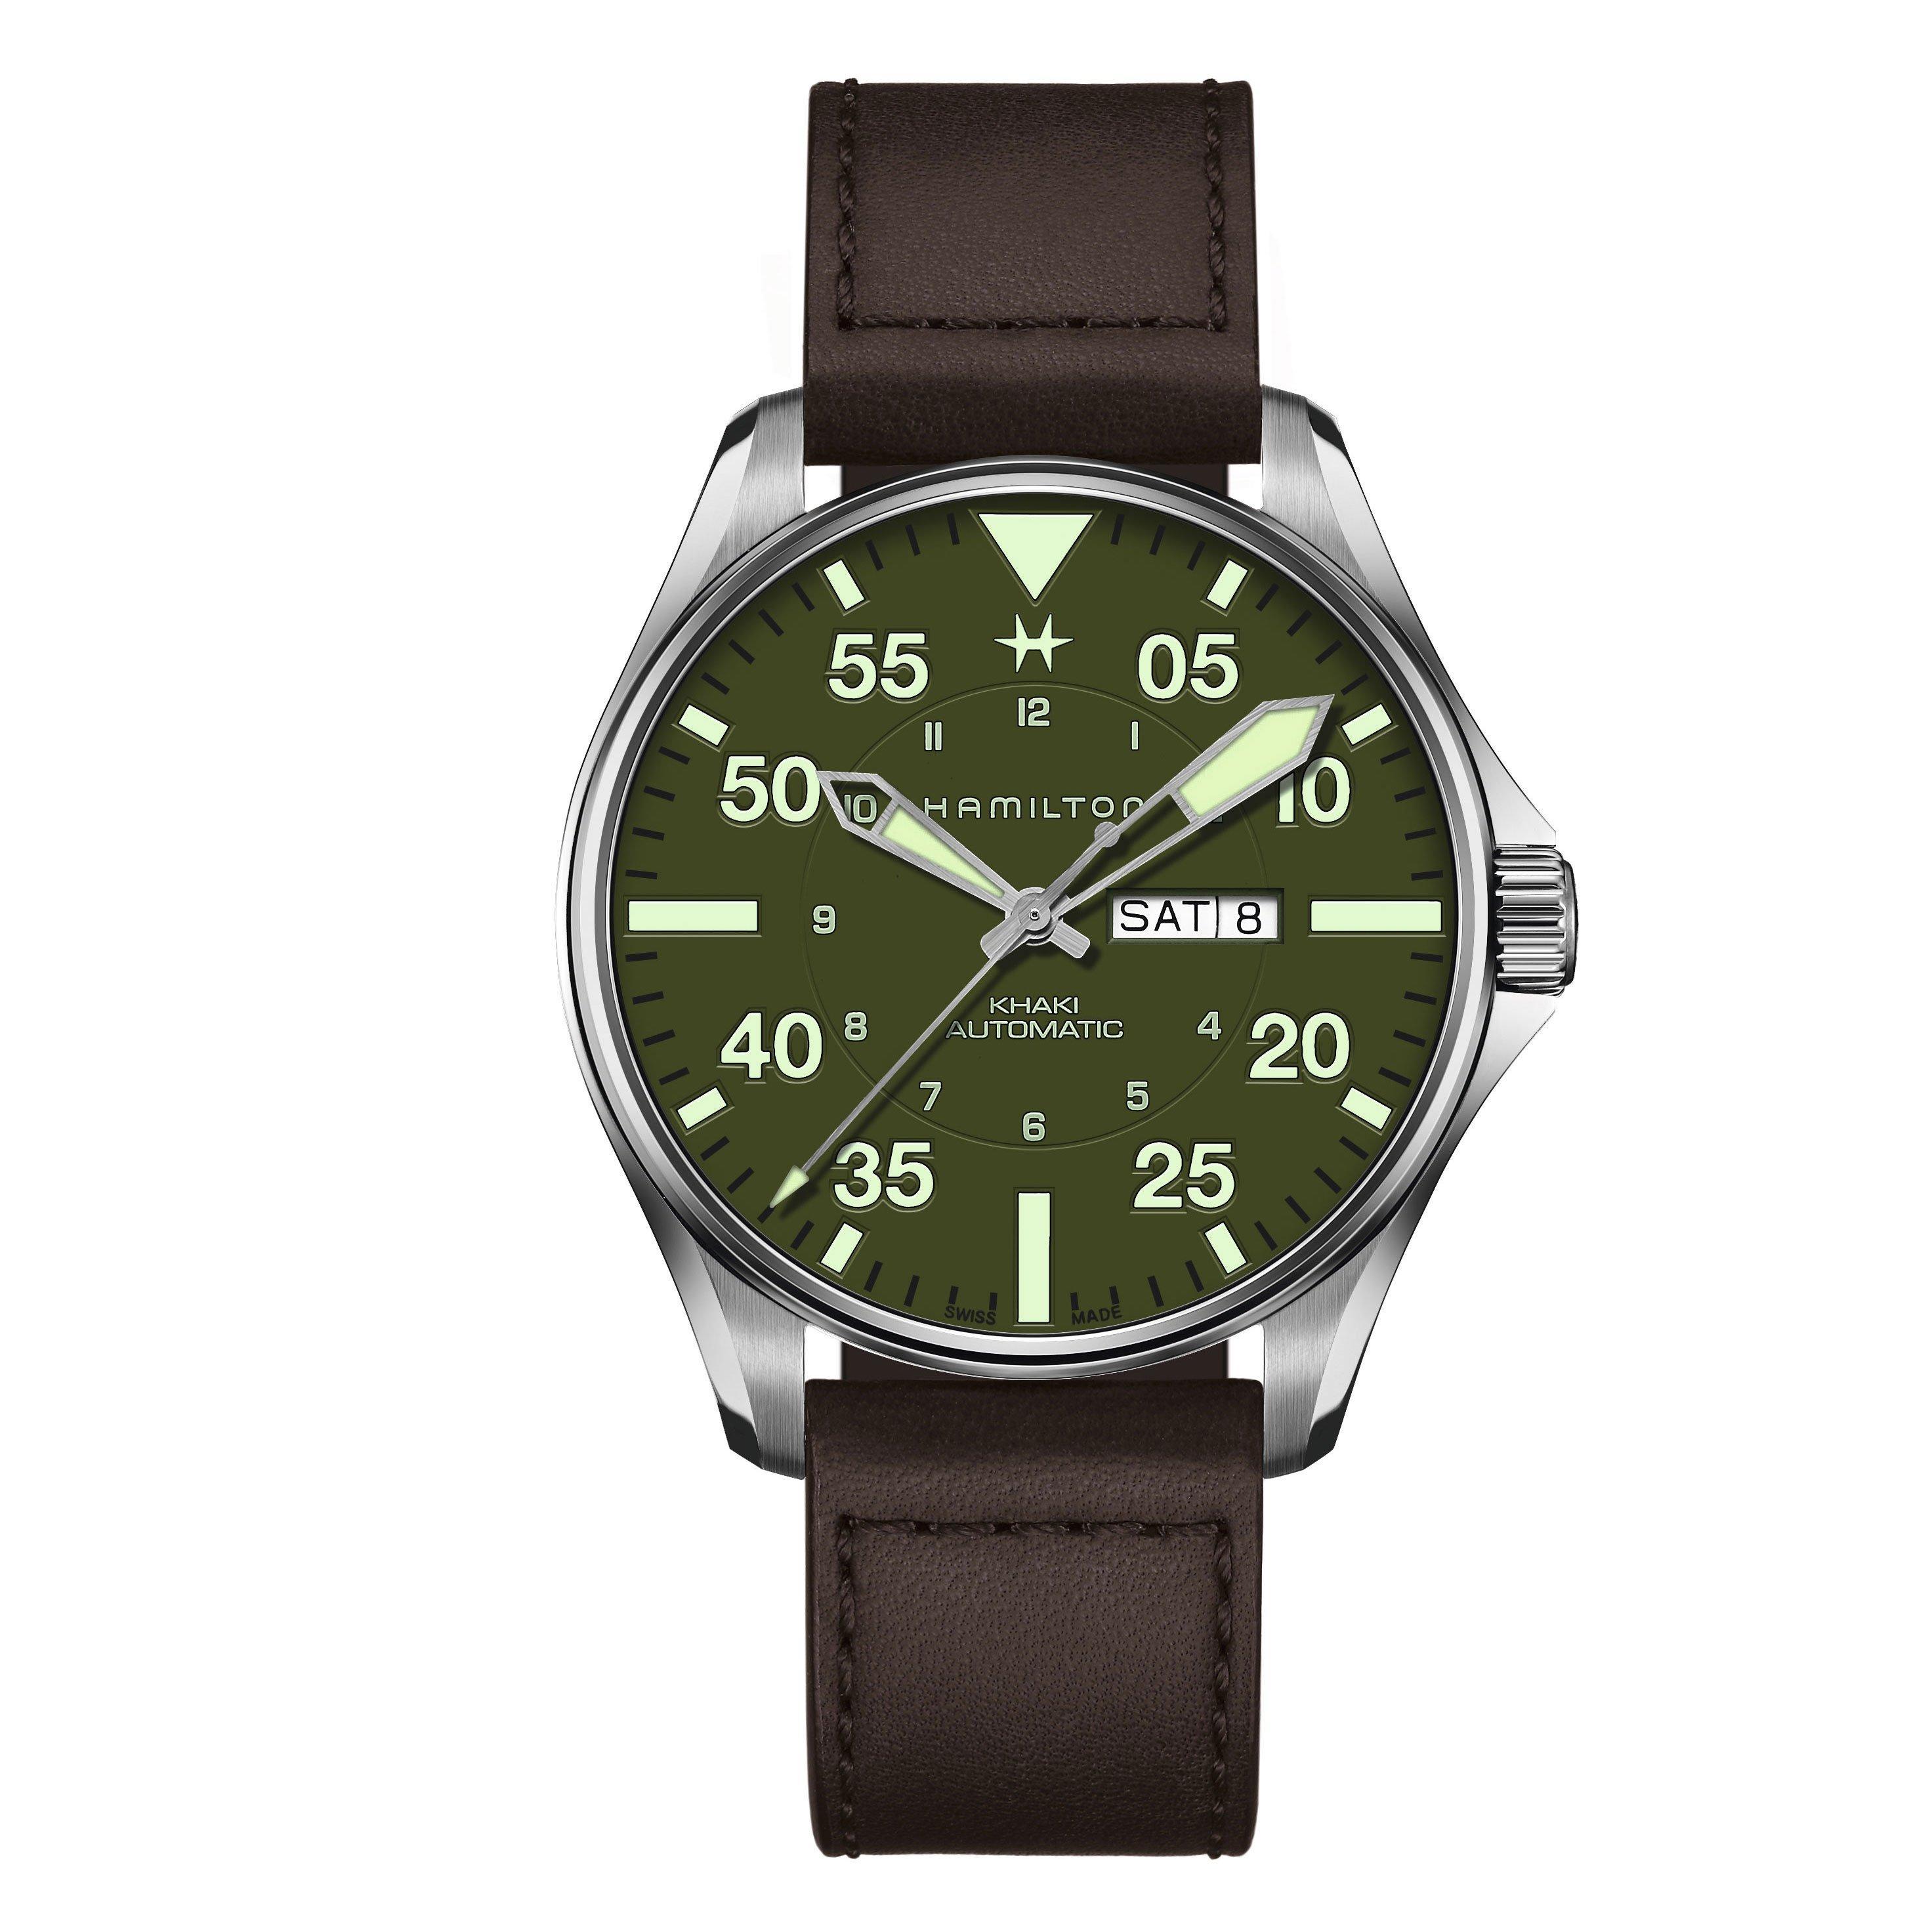 Hamilton Khaki Aviation Pilot Schott NYC Limited Edition Automatic Men's Watch